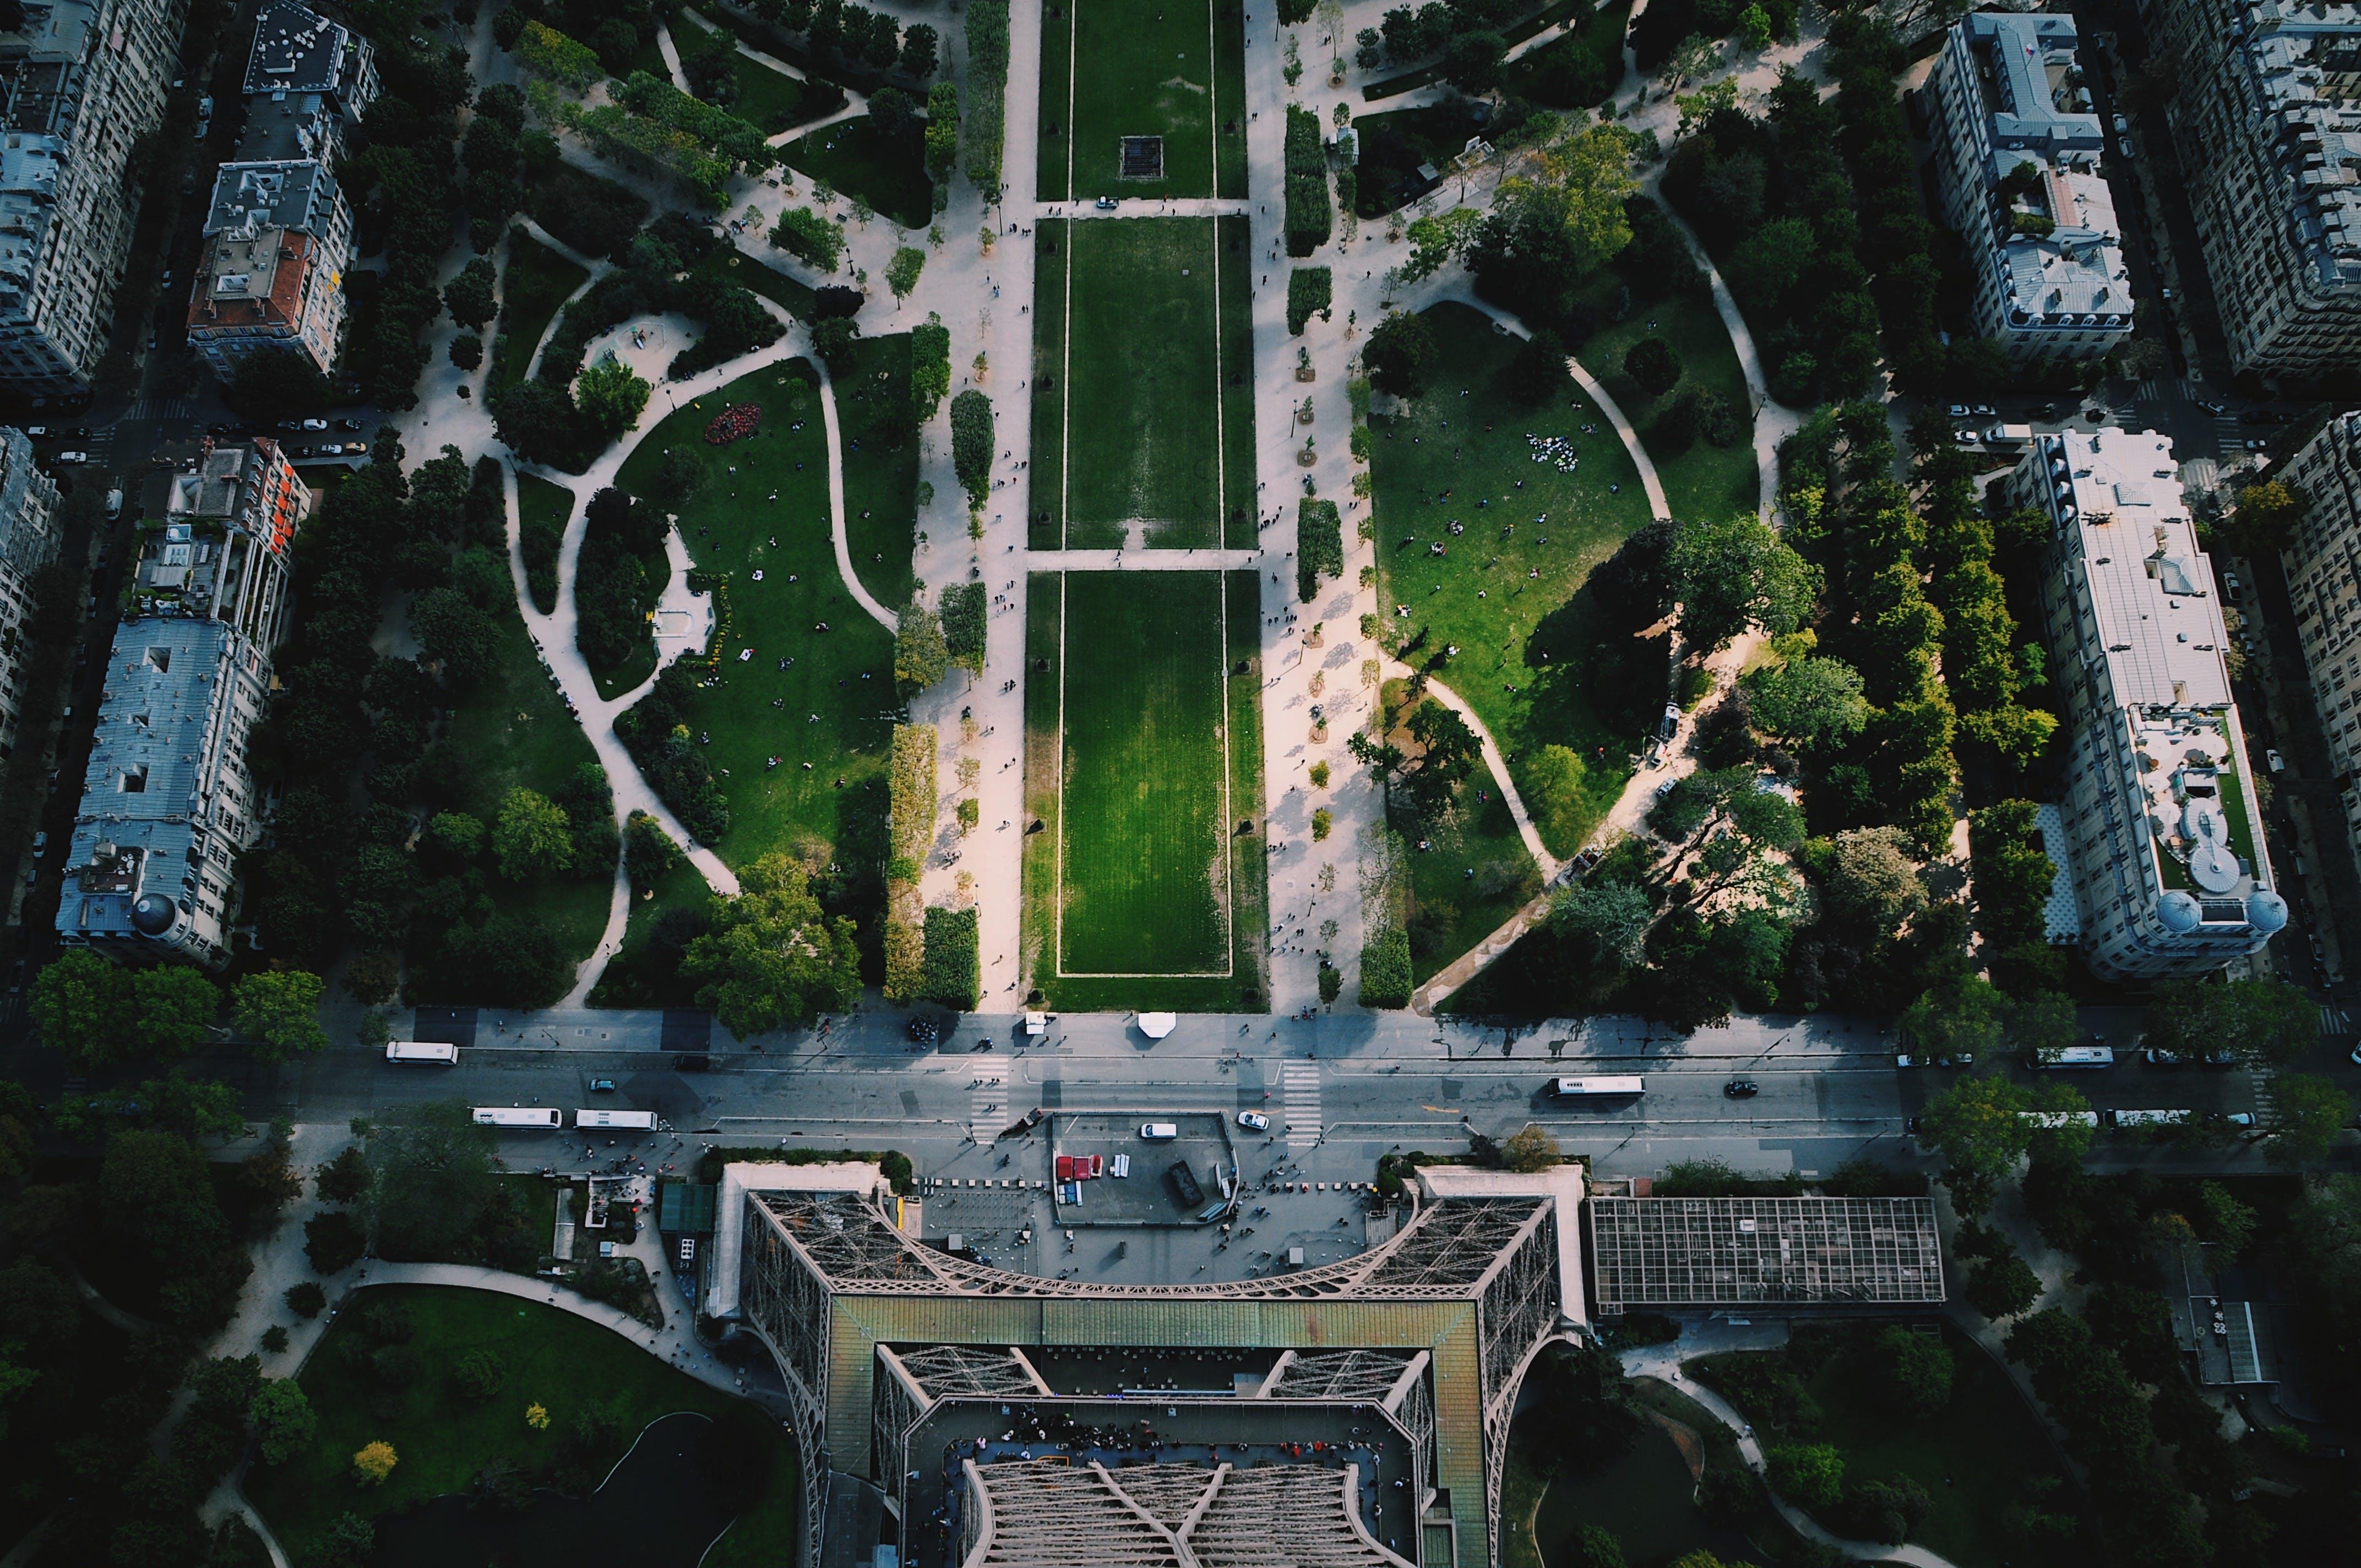 Fotos de stock gratuitas de aéreo, al aire libre, alto, arquitectura